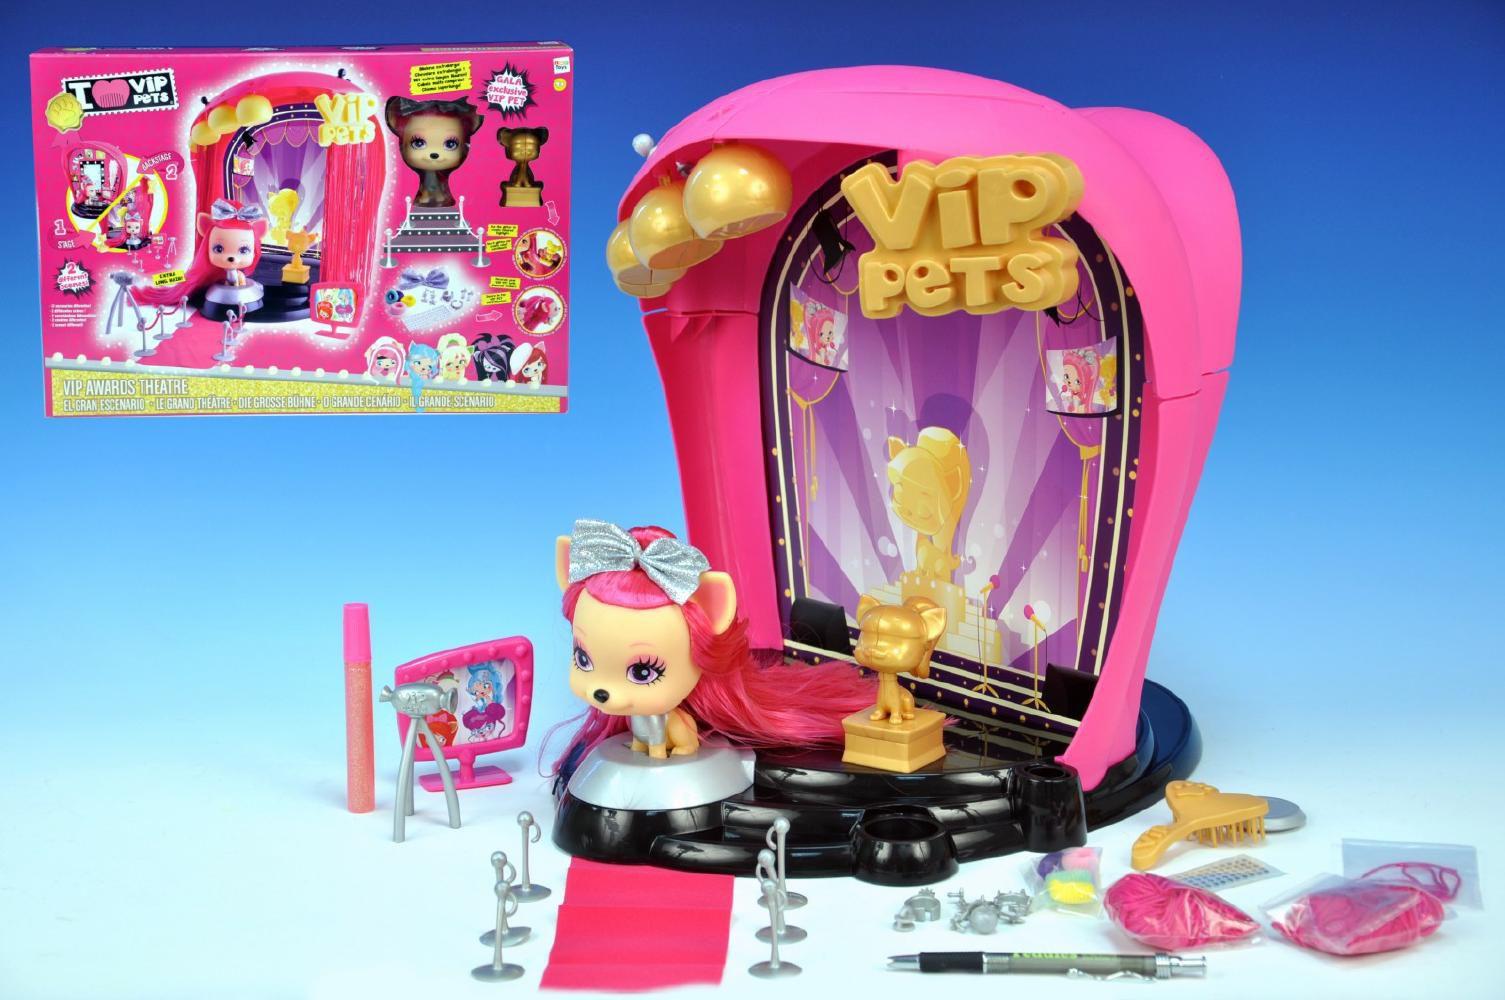 VIP Pets Divadlo s doplňky